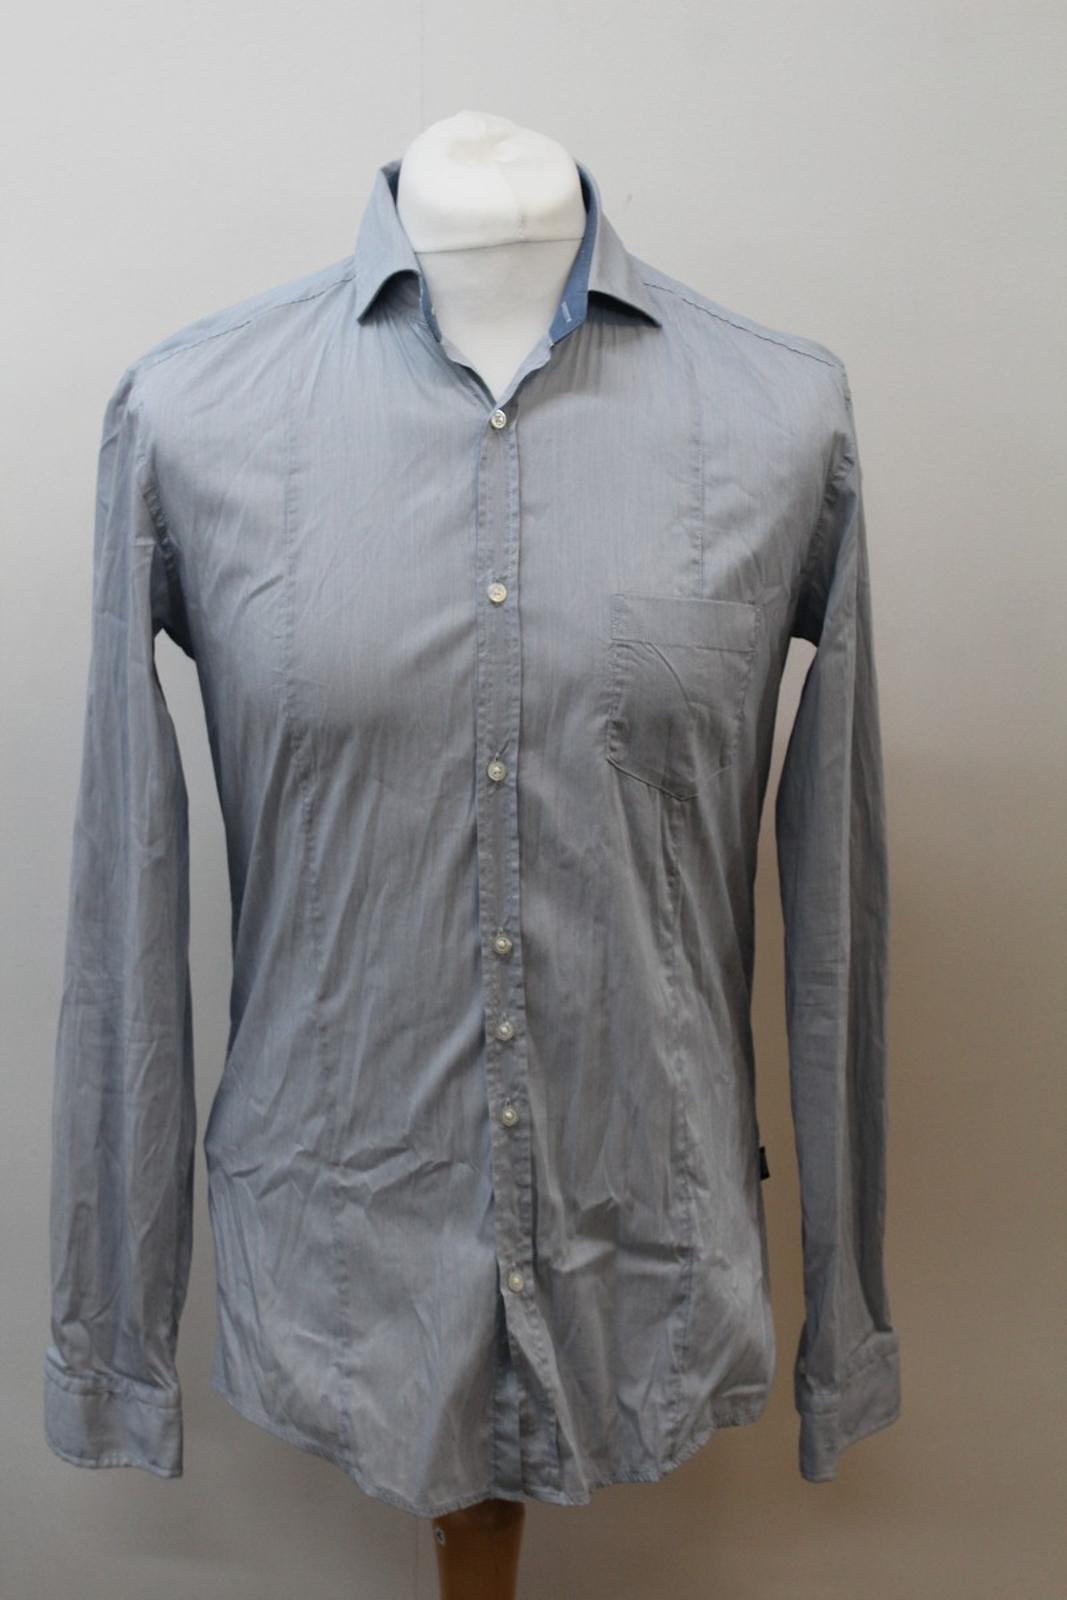 Hugo-Boss-Para-Hombre-Azul-Mezcla-De-Algodon-Manga-Larga-a-Rayas-Calce-Ajustado-Camisa-Informal-M miniatura 11